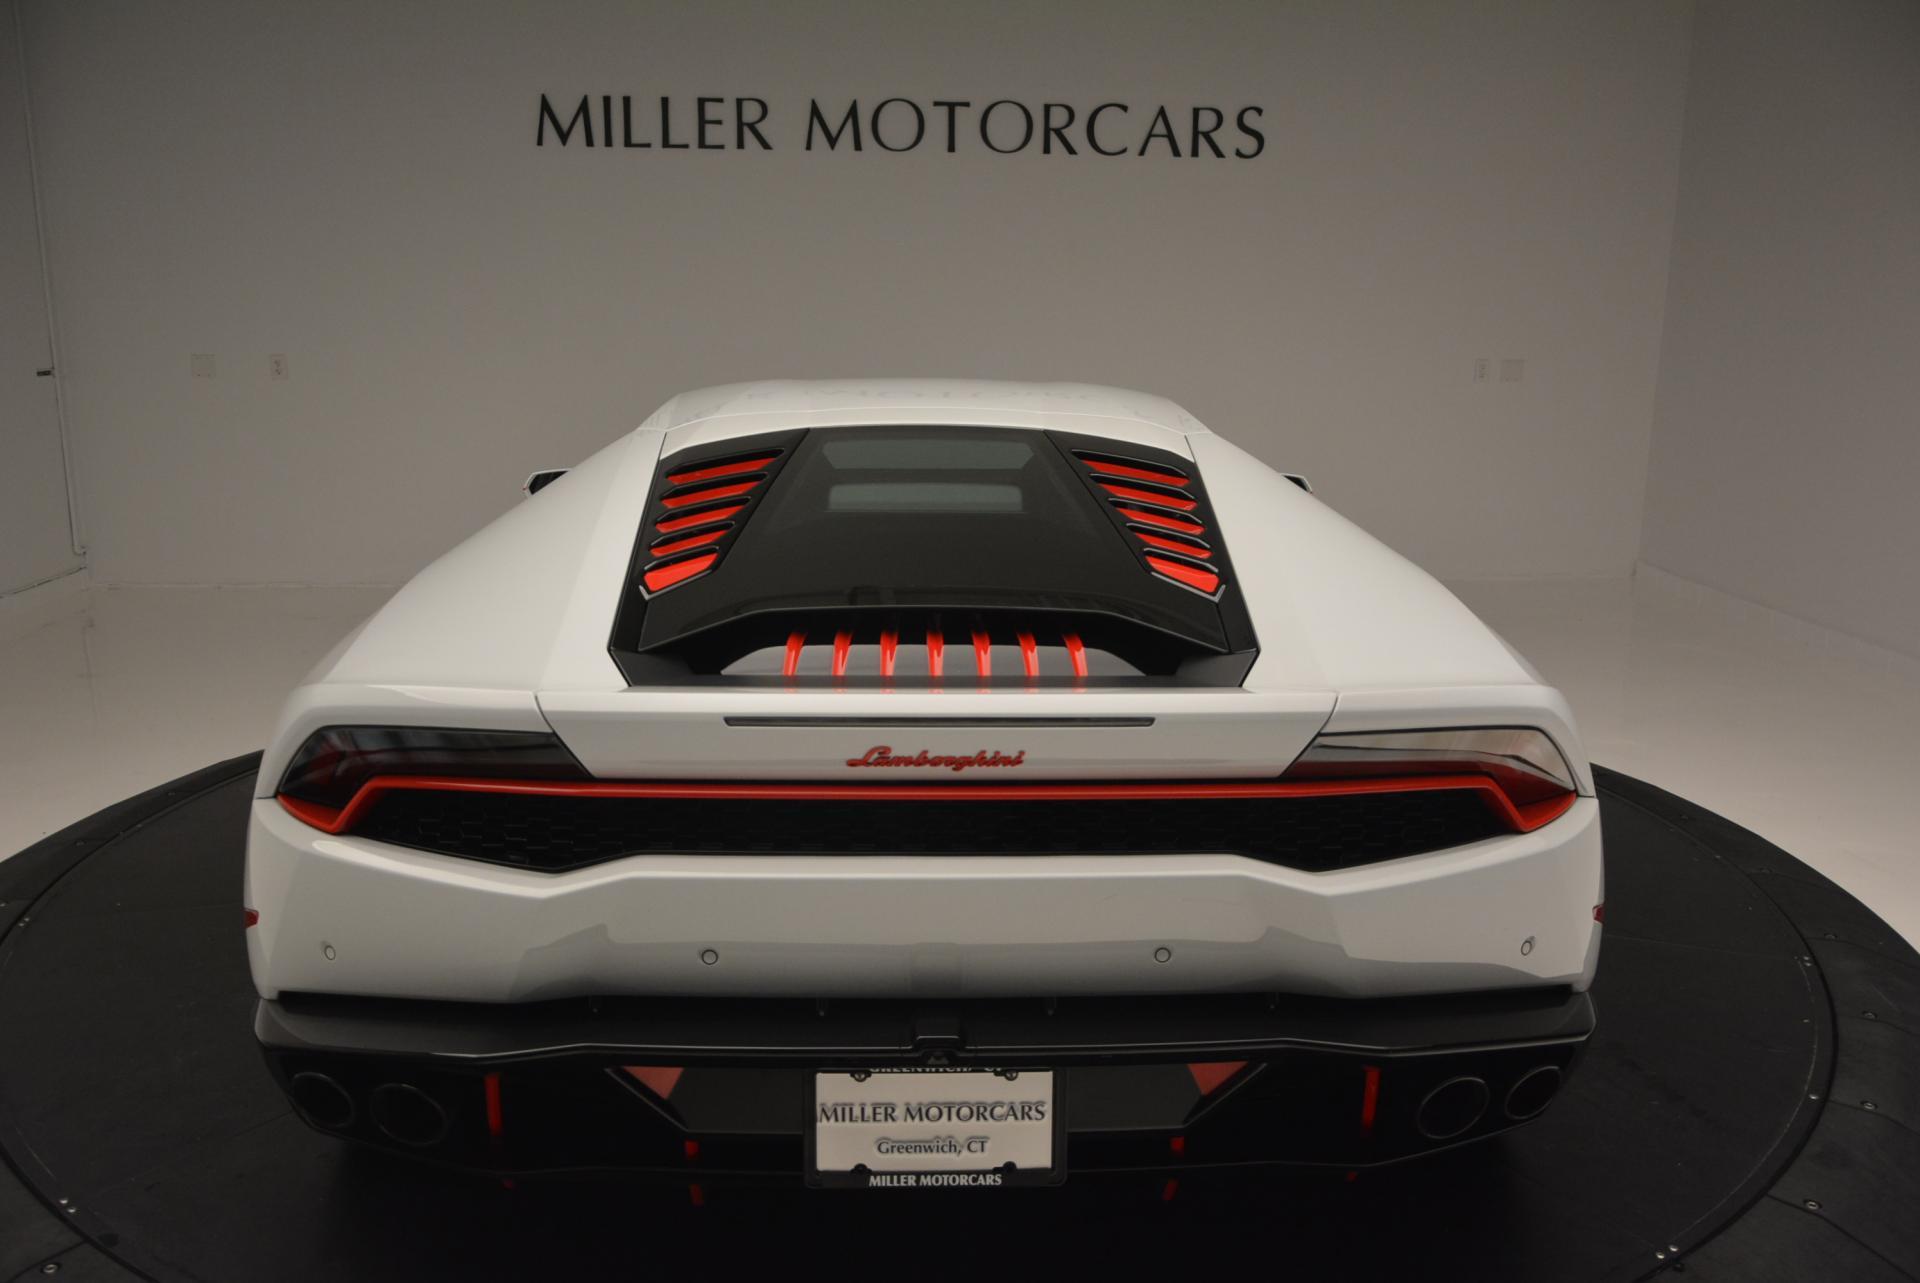 Used 2015 Lamborghini Huracan LP610-4 For Sale In Greenwich, CT 114_p7